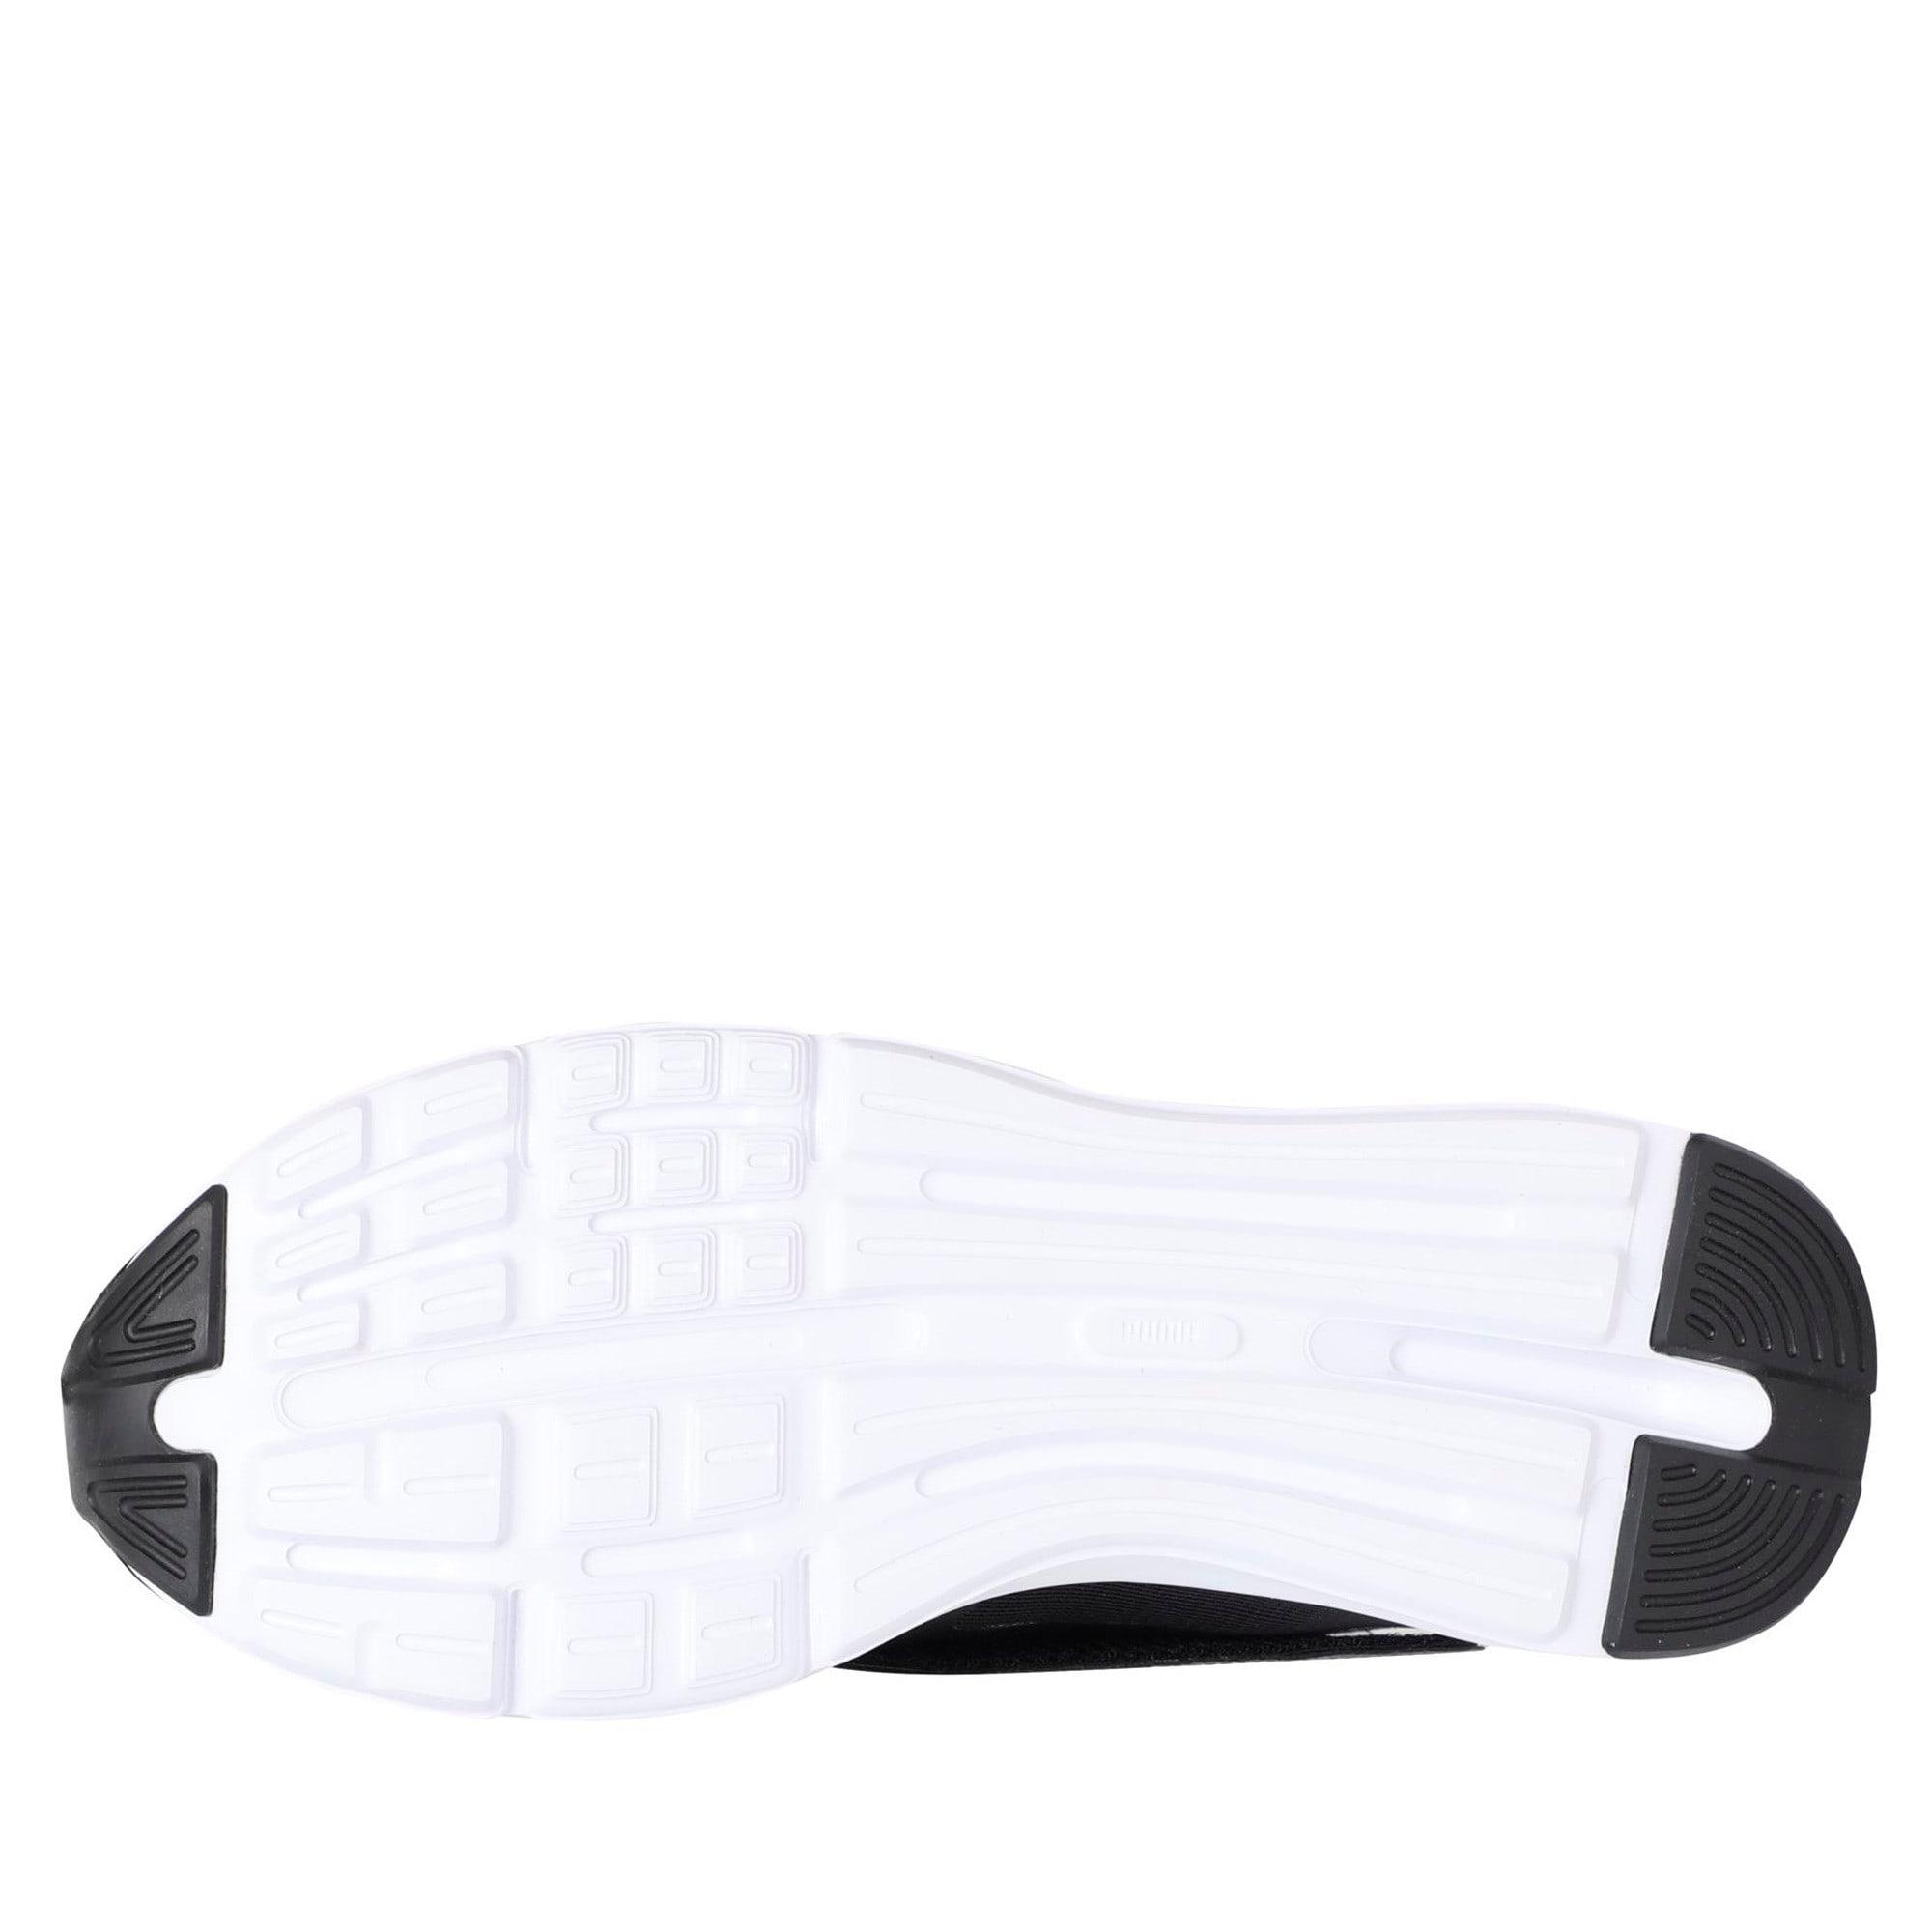 Thumbnail 4 of Enzo Strap Mesh Men's Running Shoes, Puma Black-Flame Scarlet, medium-IND